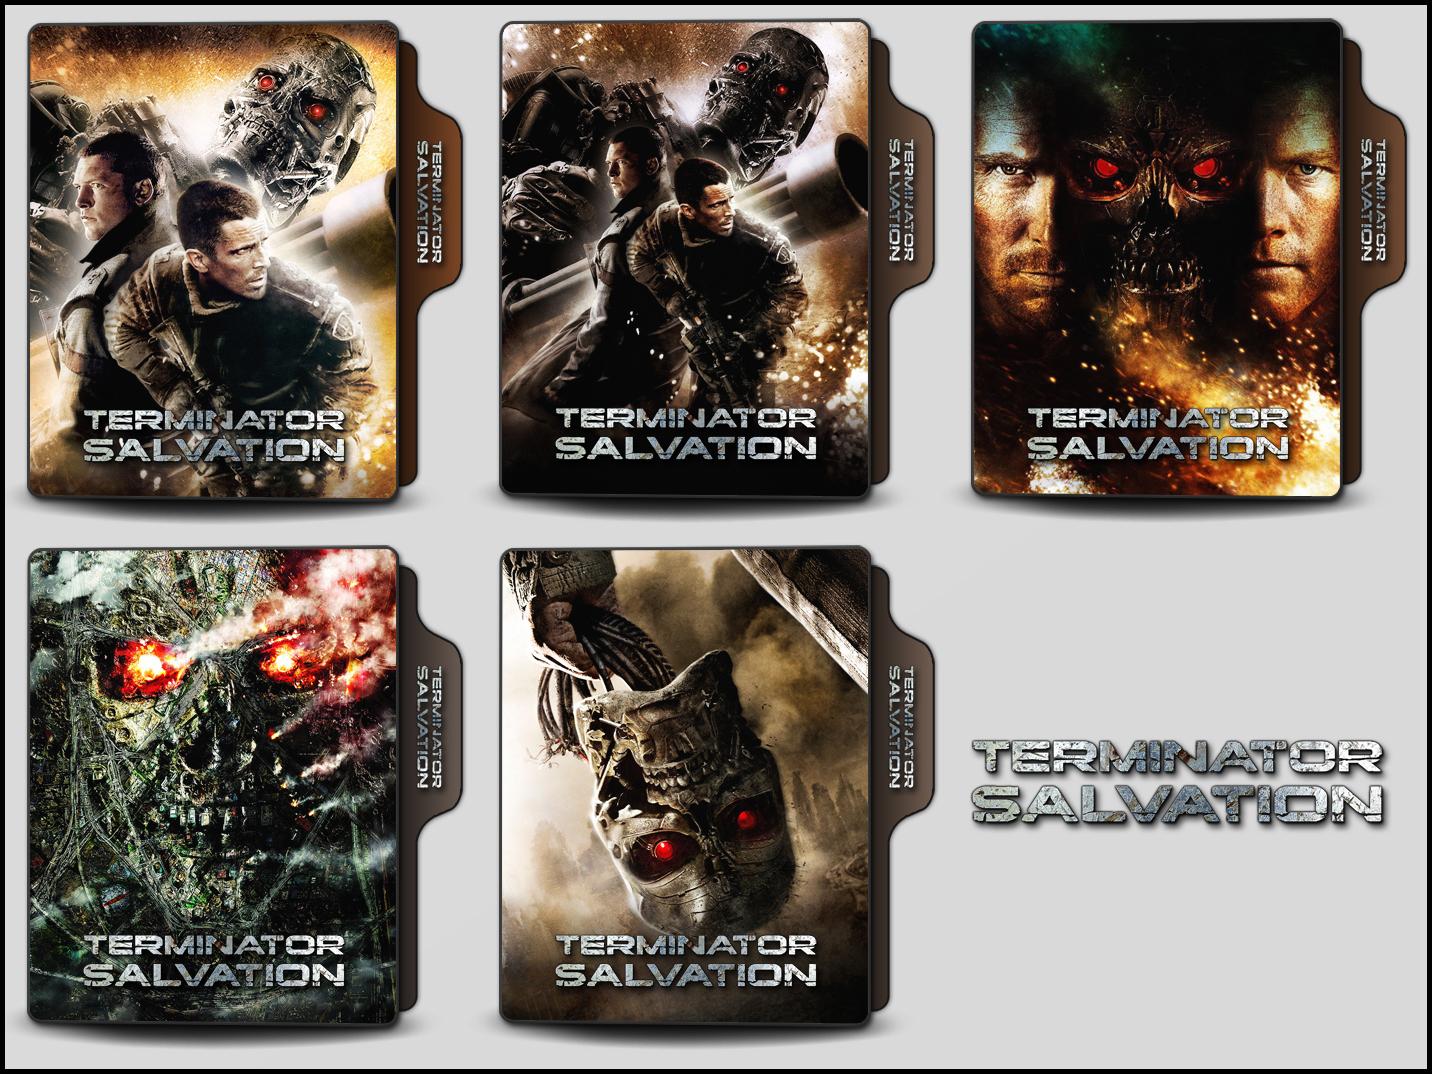 Terminator Salvation 2009 Folder Icons By Onlystylematters On Deviantart